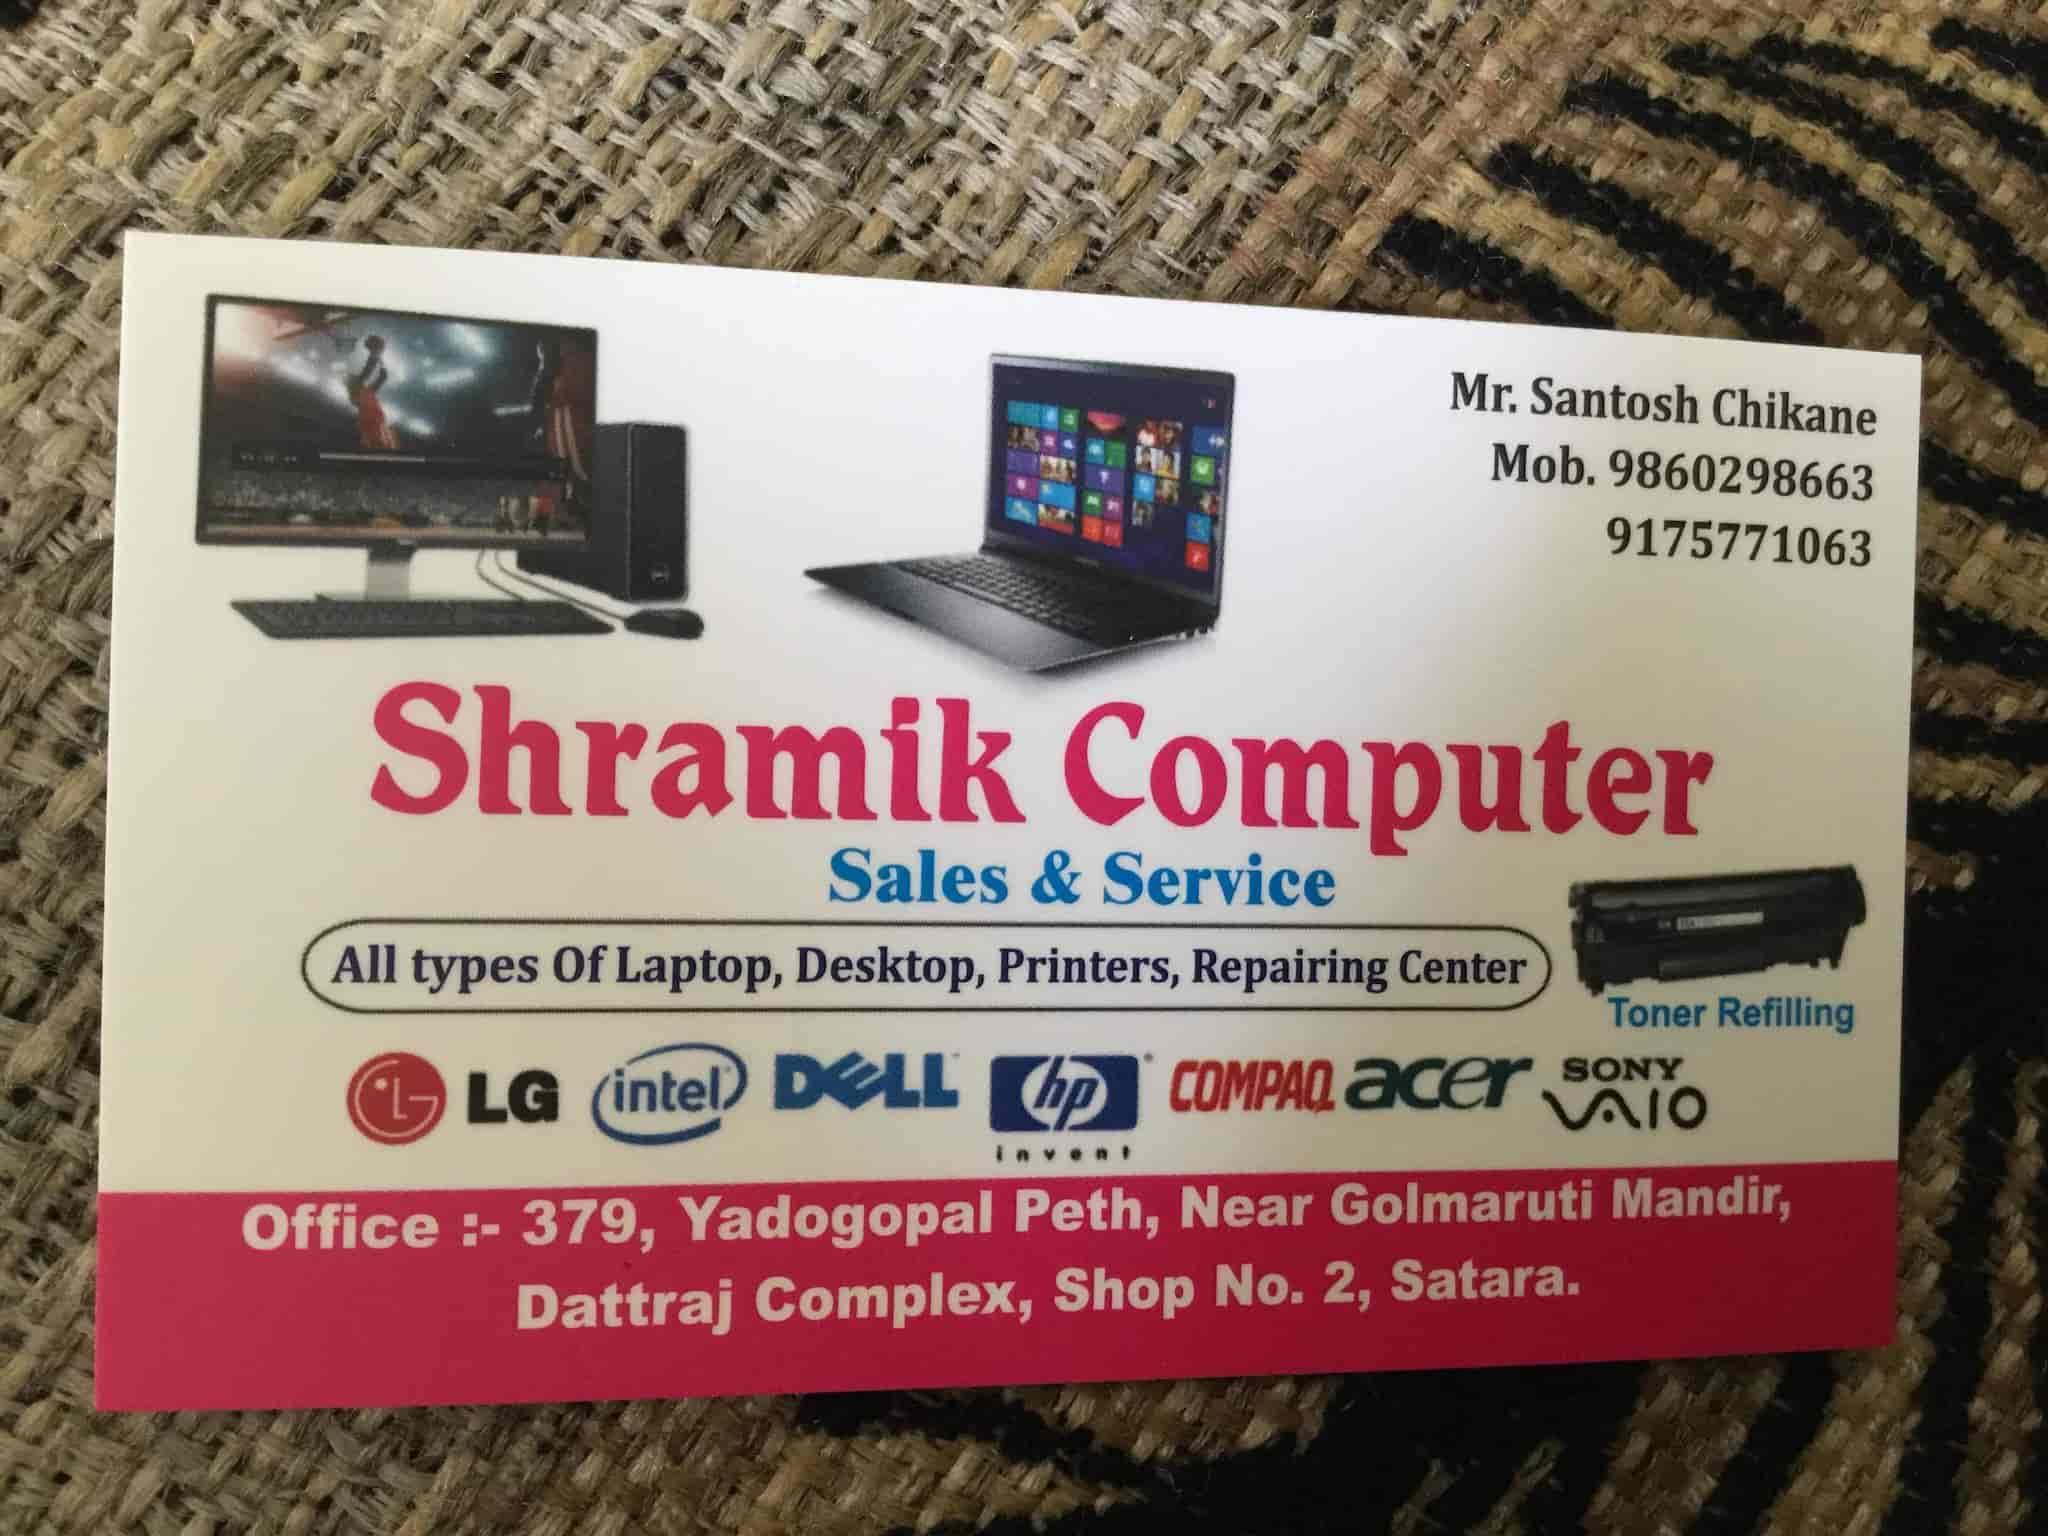 Shramik Computers Photos, , Satara- Pictures & Images Gallery - Justdial